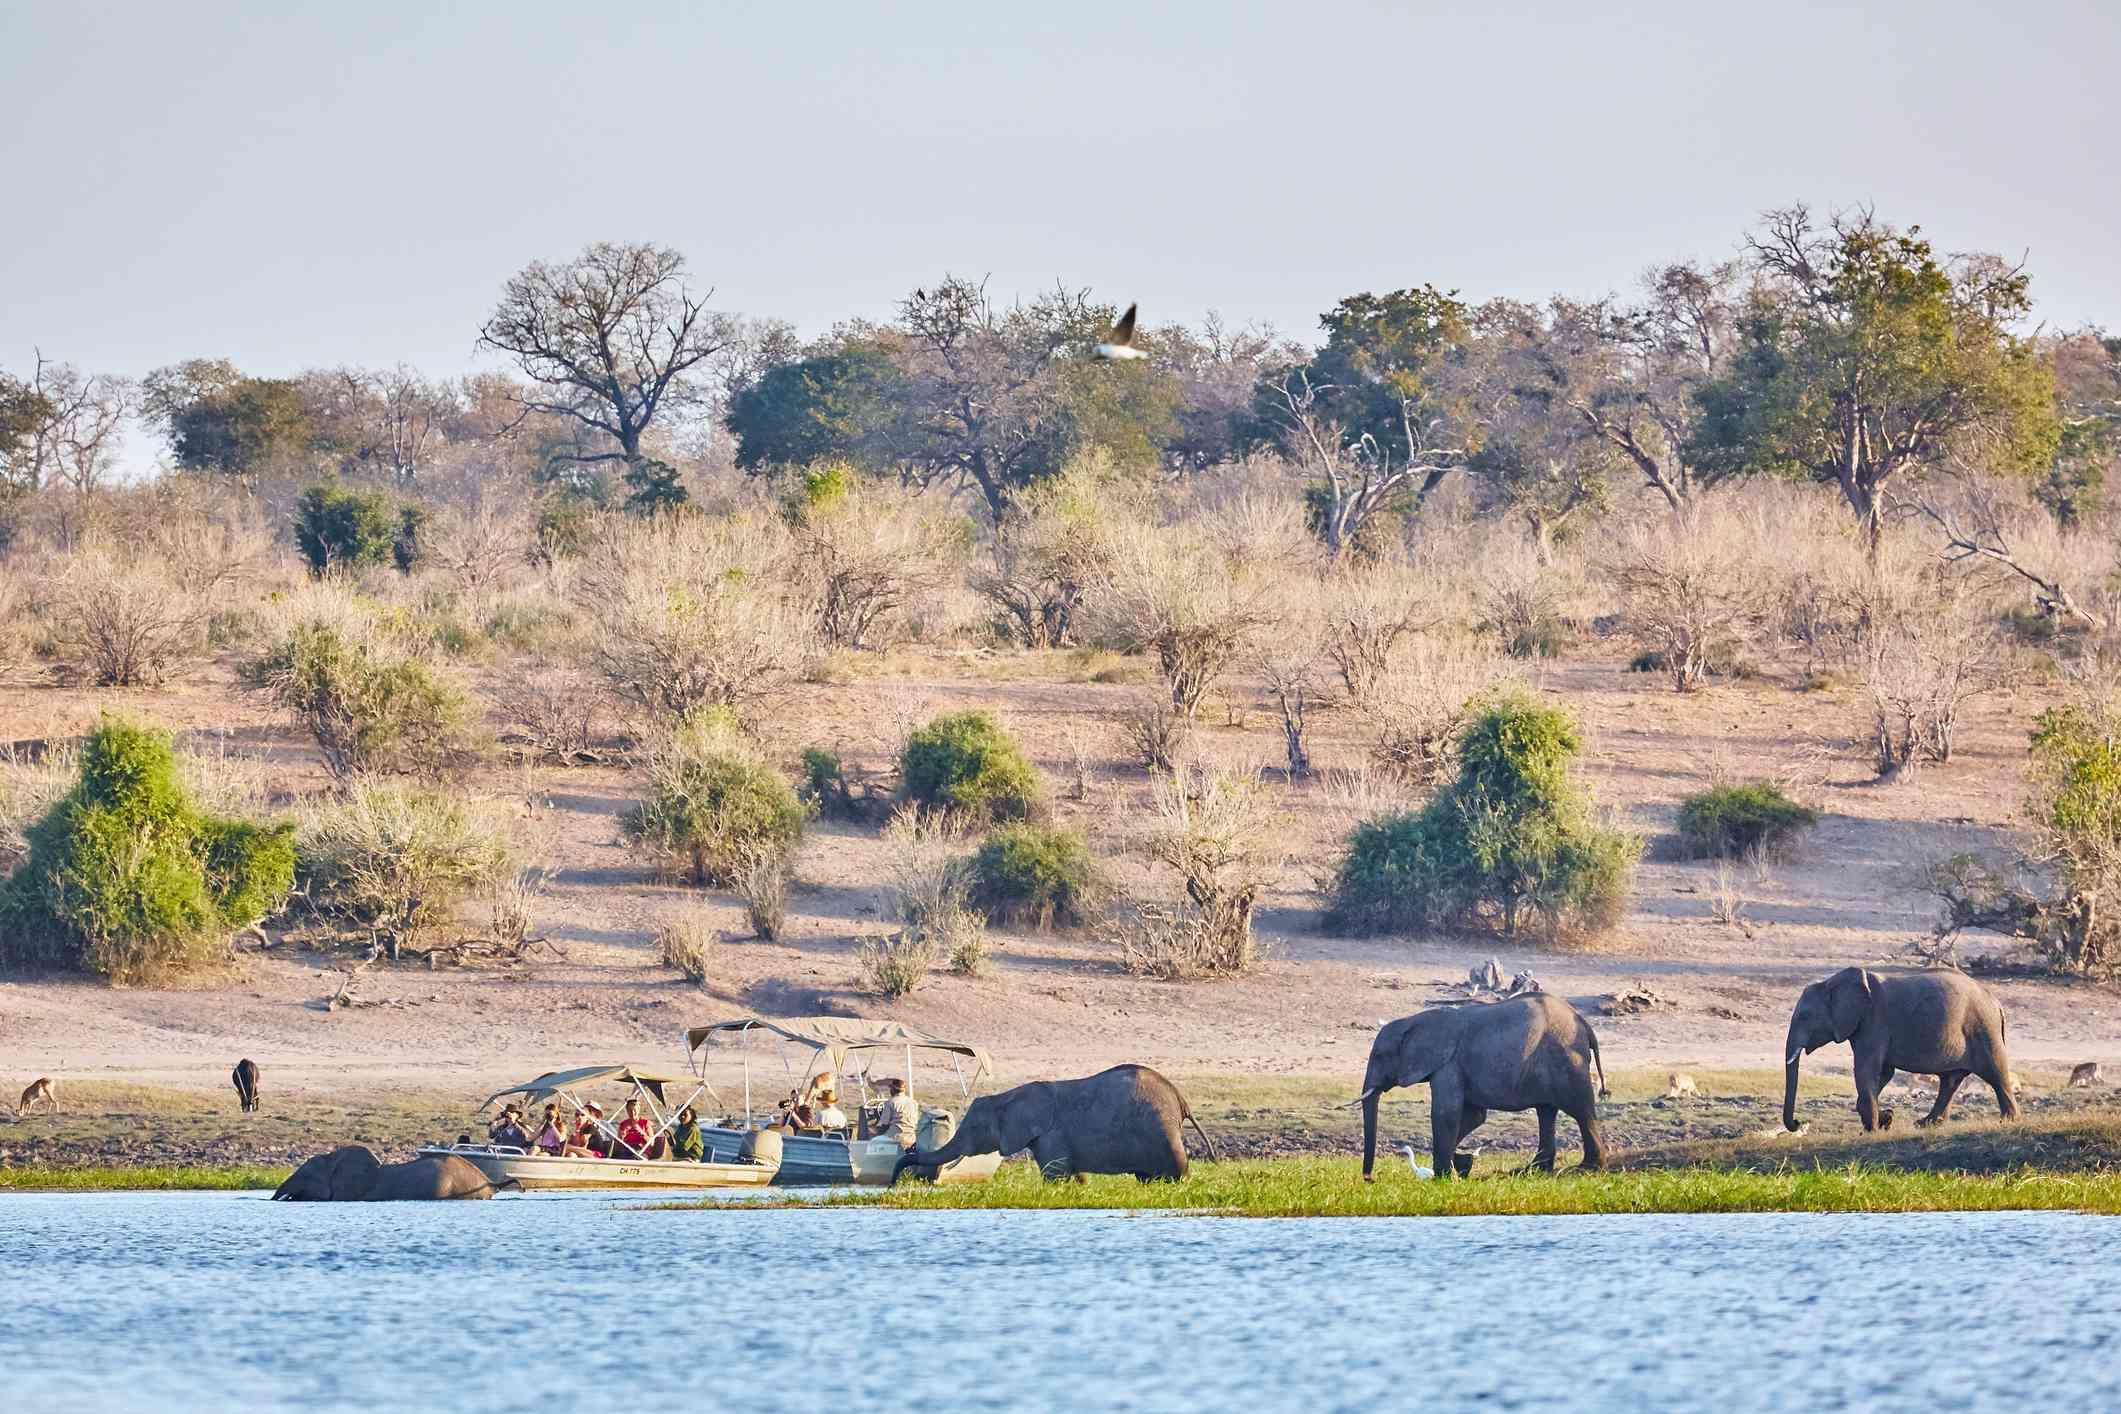 Elephants approach a river safari boat on the Chobe River, Botswana